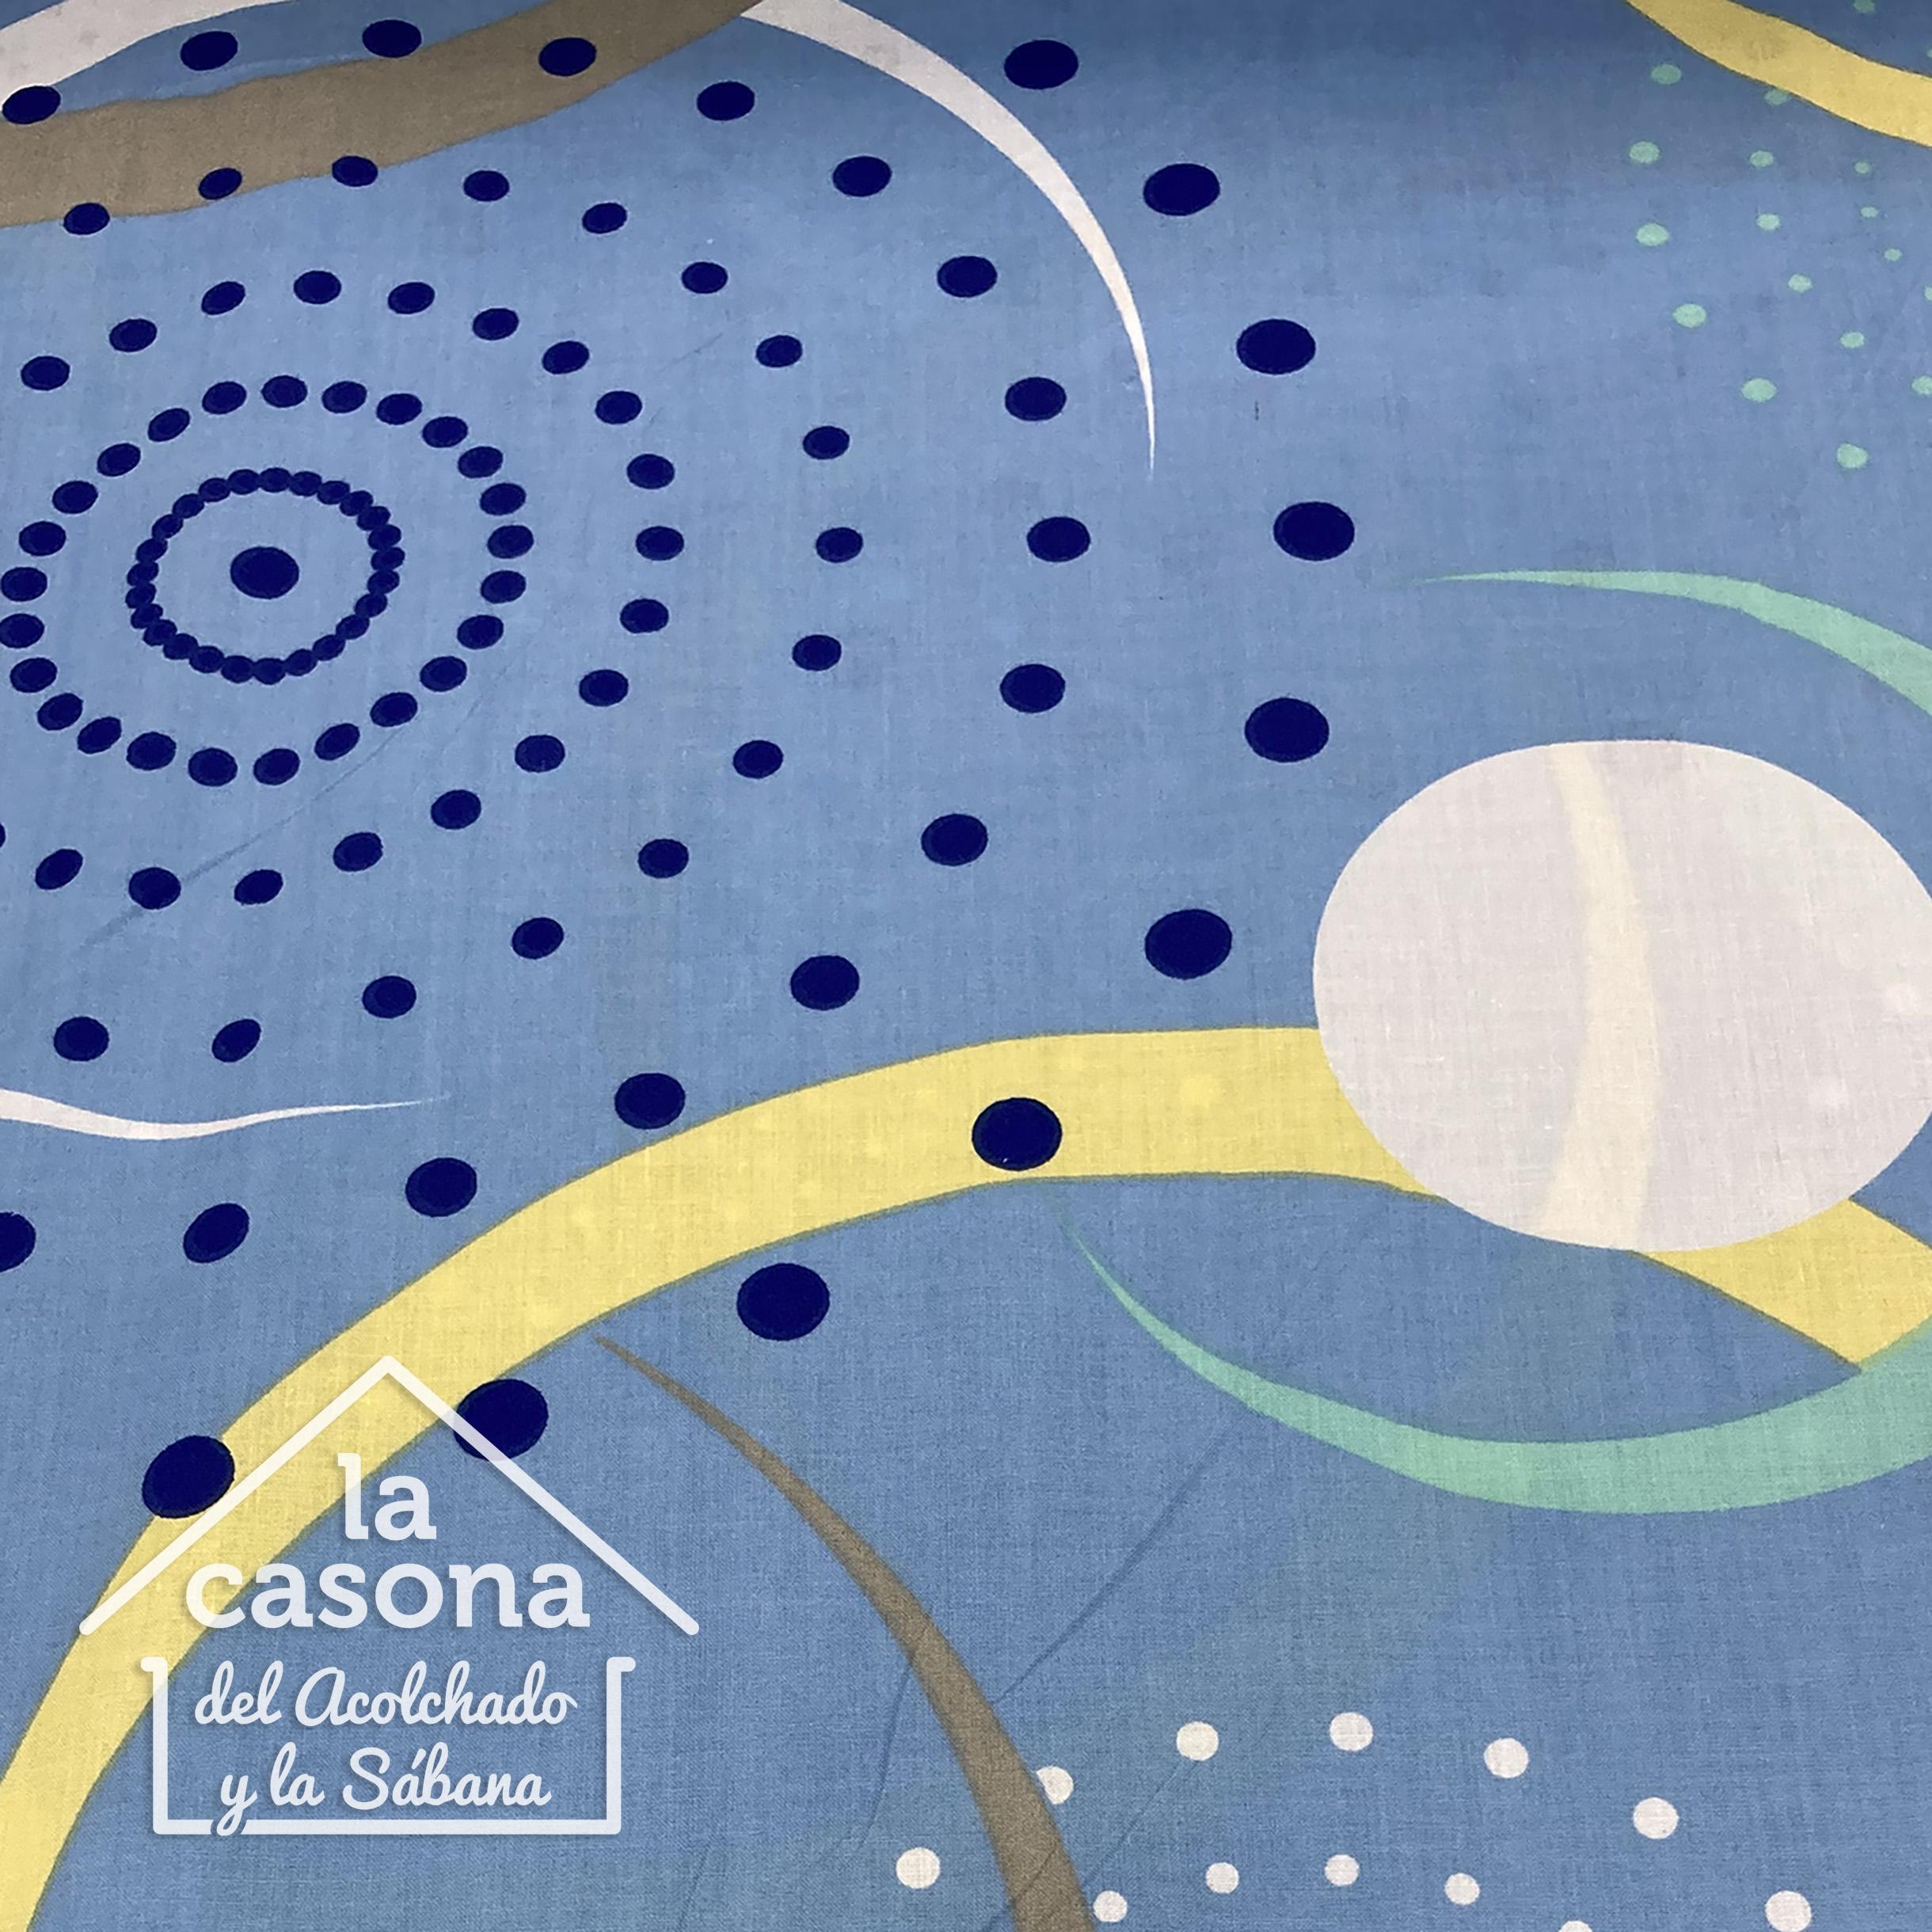 enfoque sabana azul con diseños en espiral algodón de 200 hilos